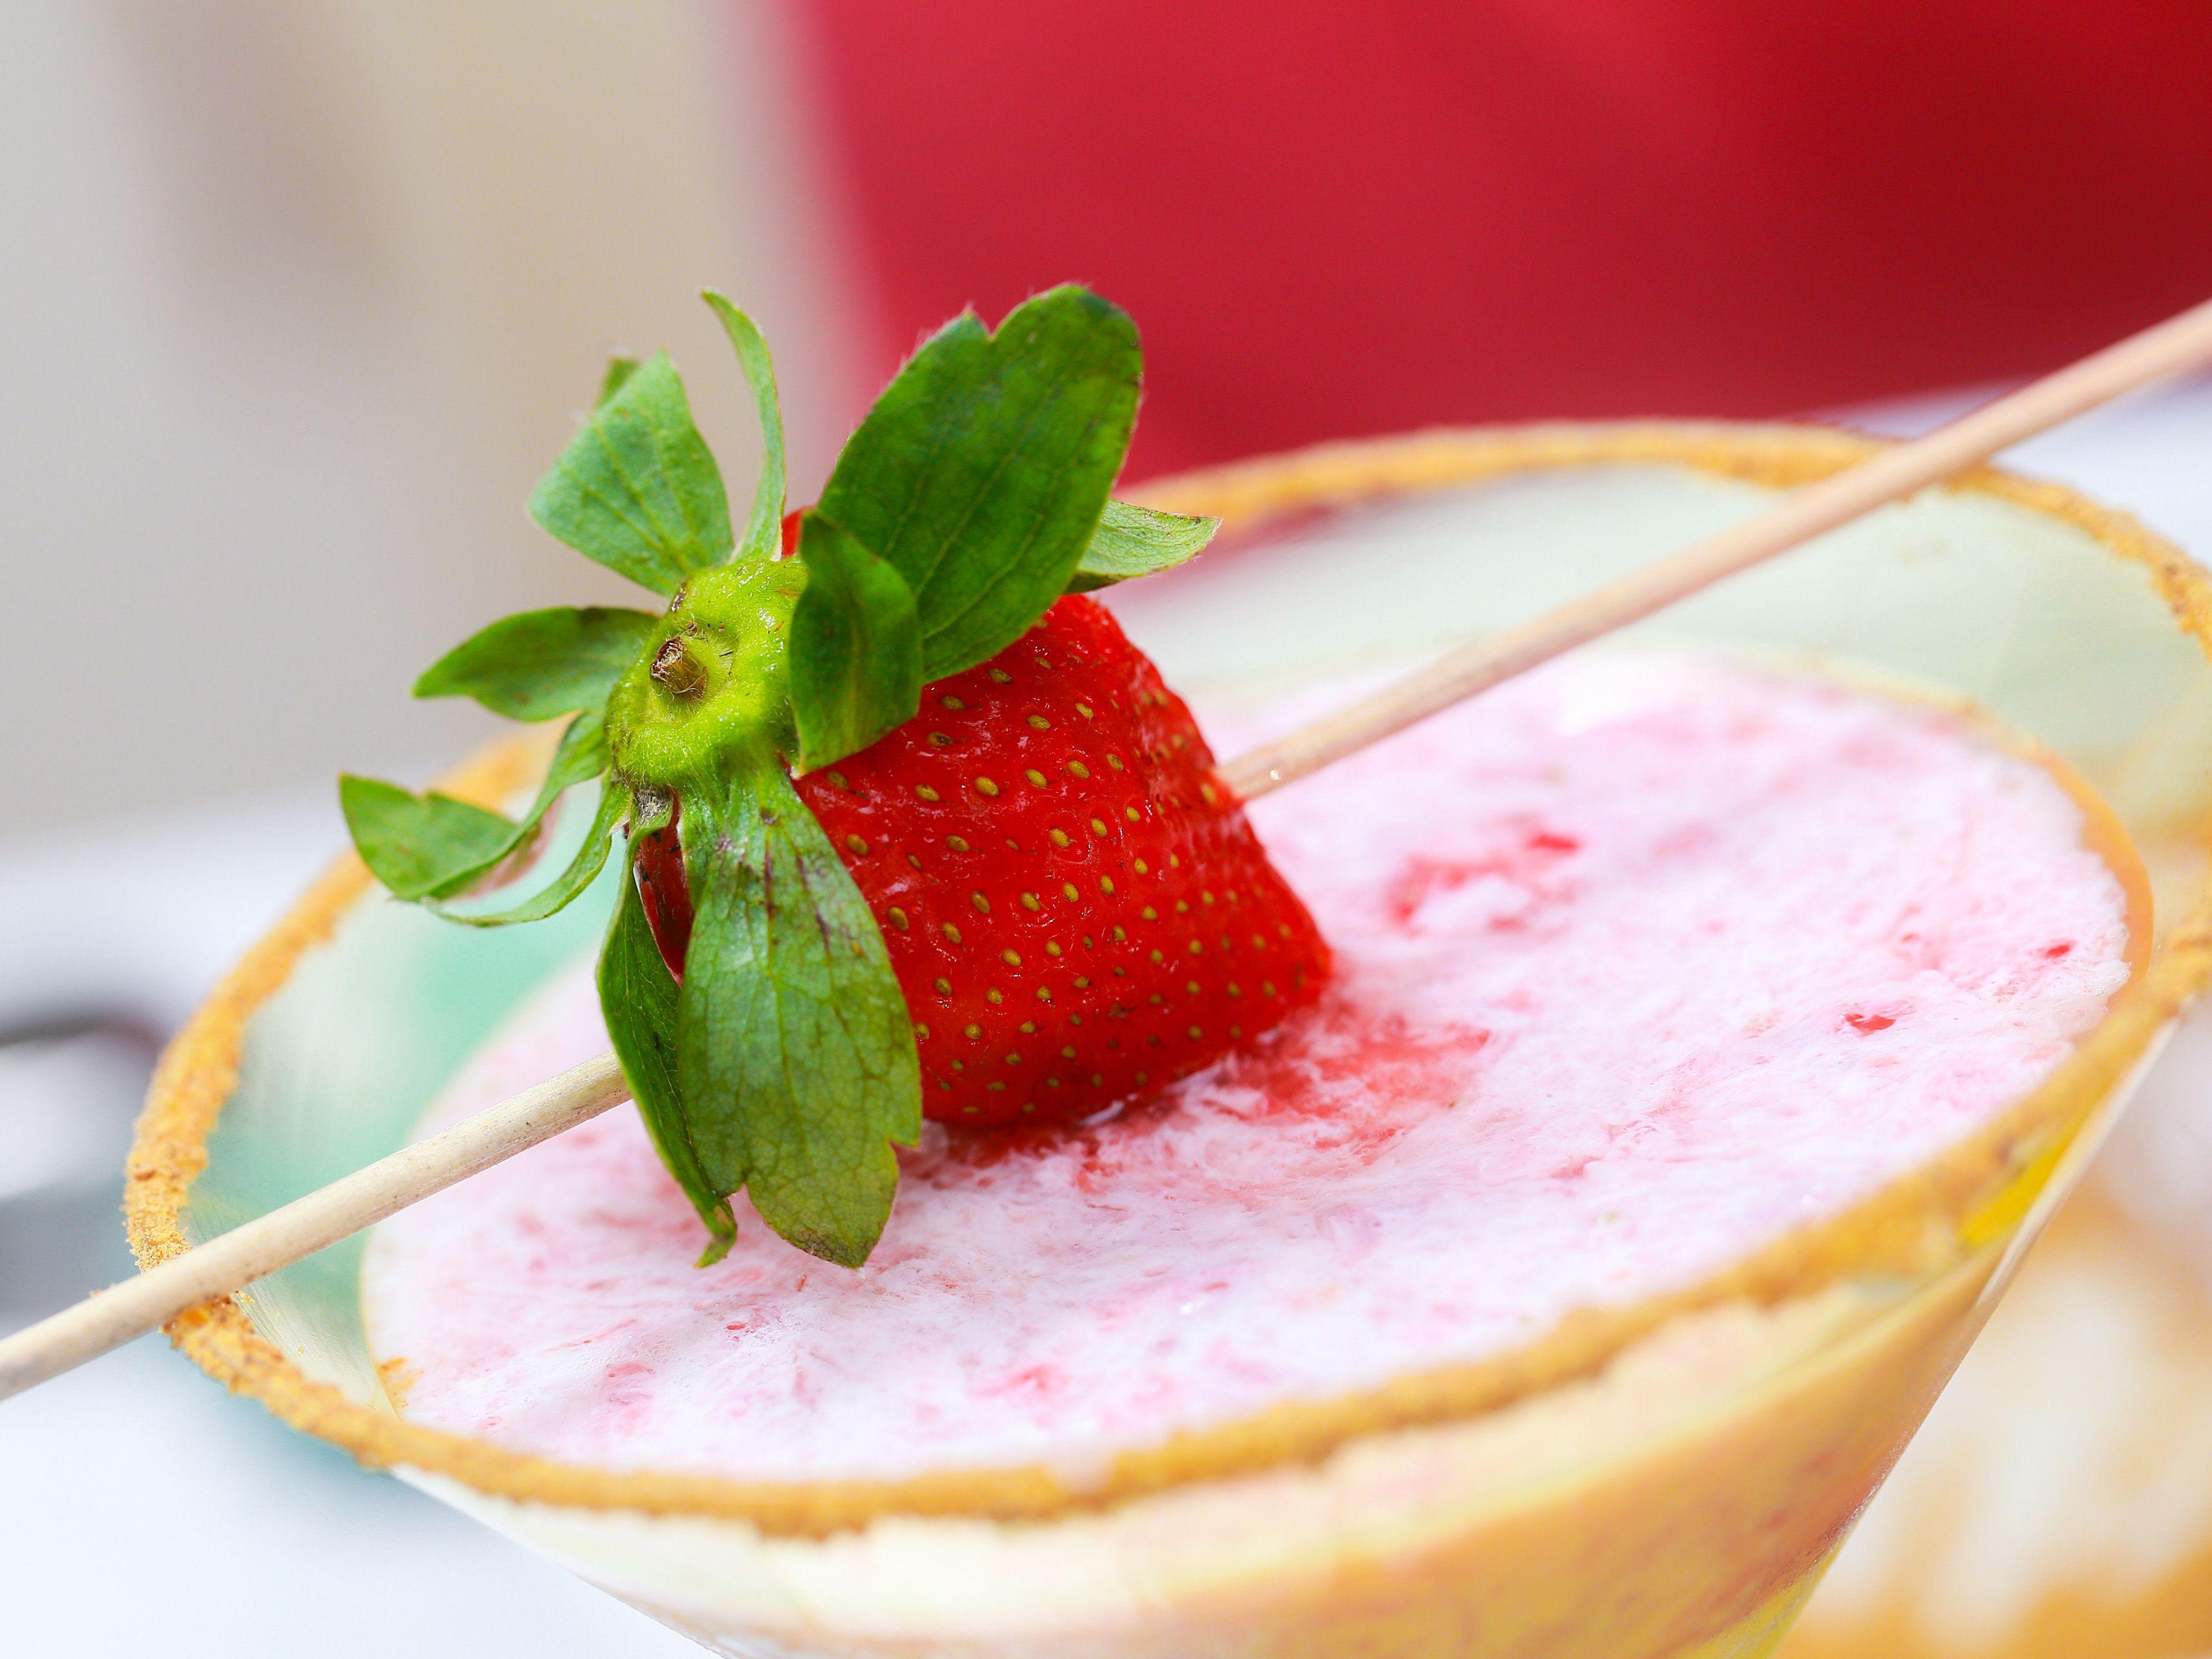 How To Make A Strawberry Cheesecake Martini Strawberry Cheesecake Sweet Martini Food